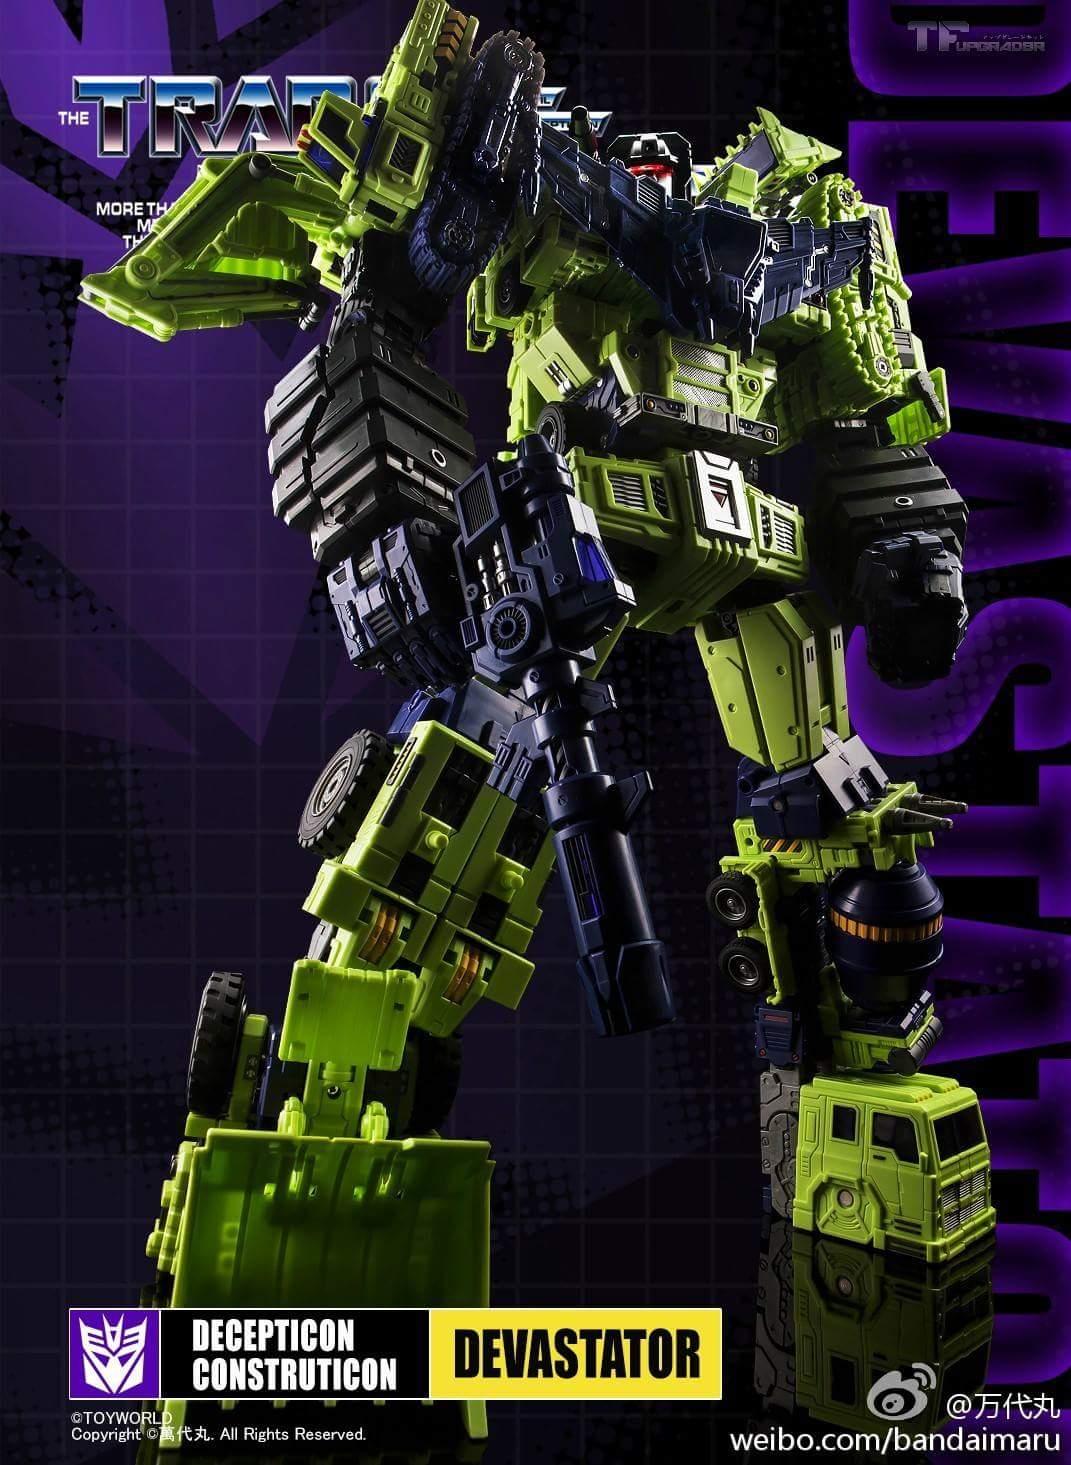 [Toyworld] Produit Tiers - Jouet TW-C Constructor aka Devastator/Dévastateur (Version vert G1 et jaune G2) - Page 9 FjnU3TLY